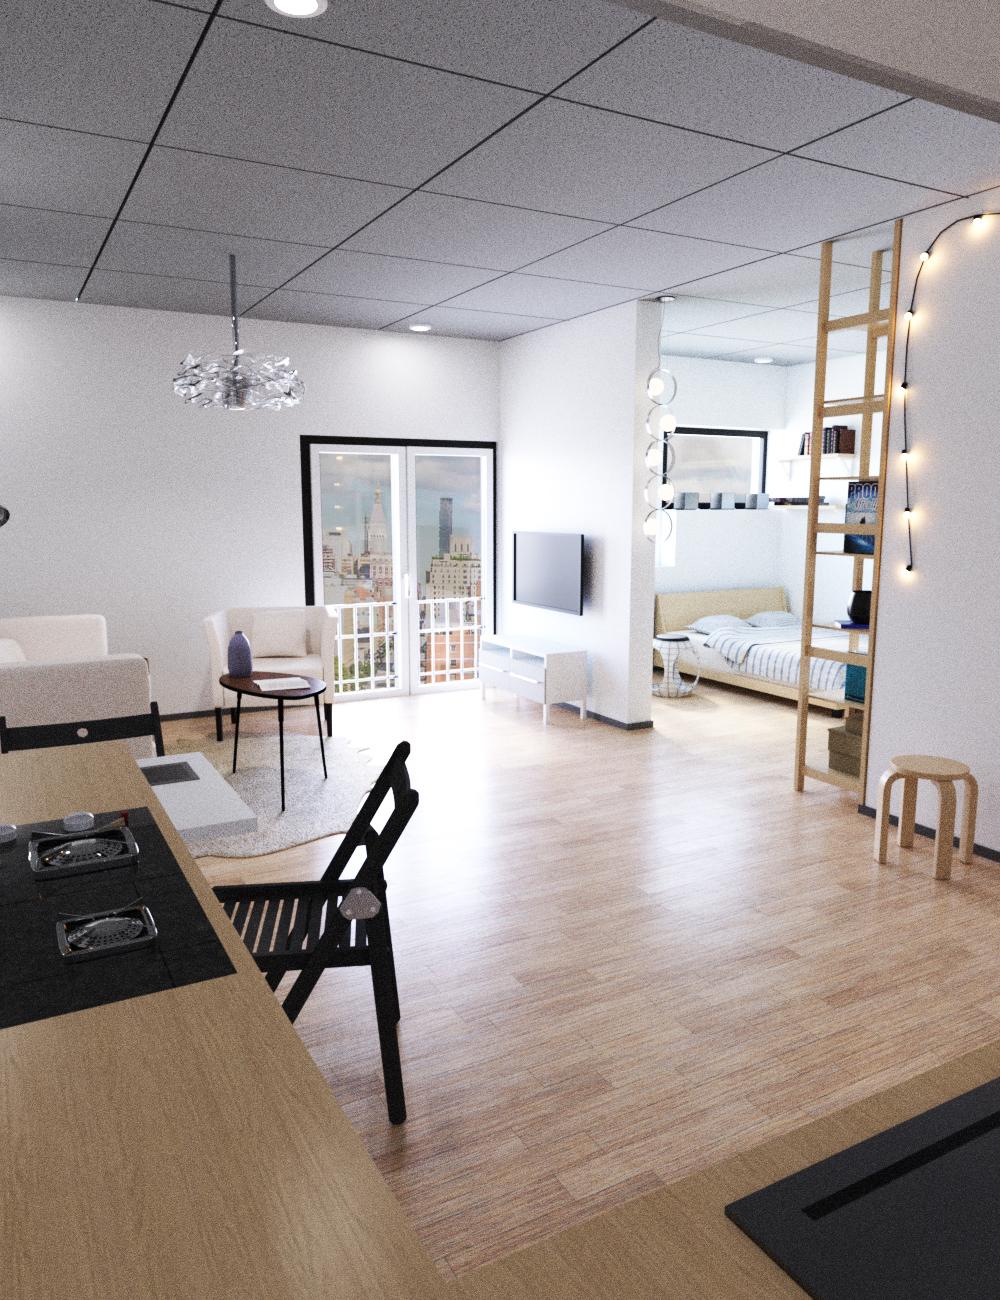 Mini Apartment by: Tesla3dCorp, 3D Models by Daz 3D